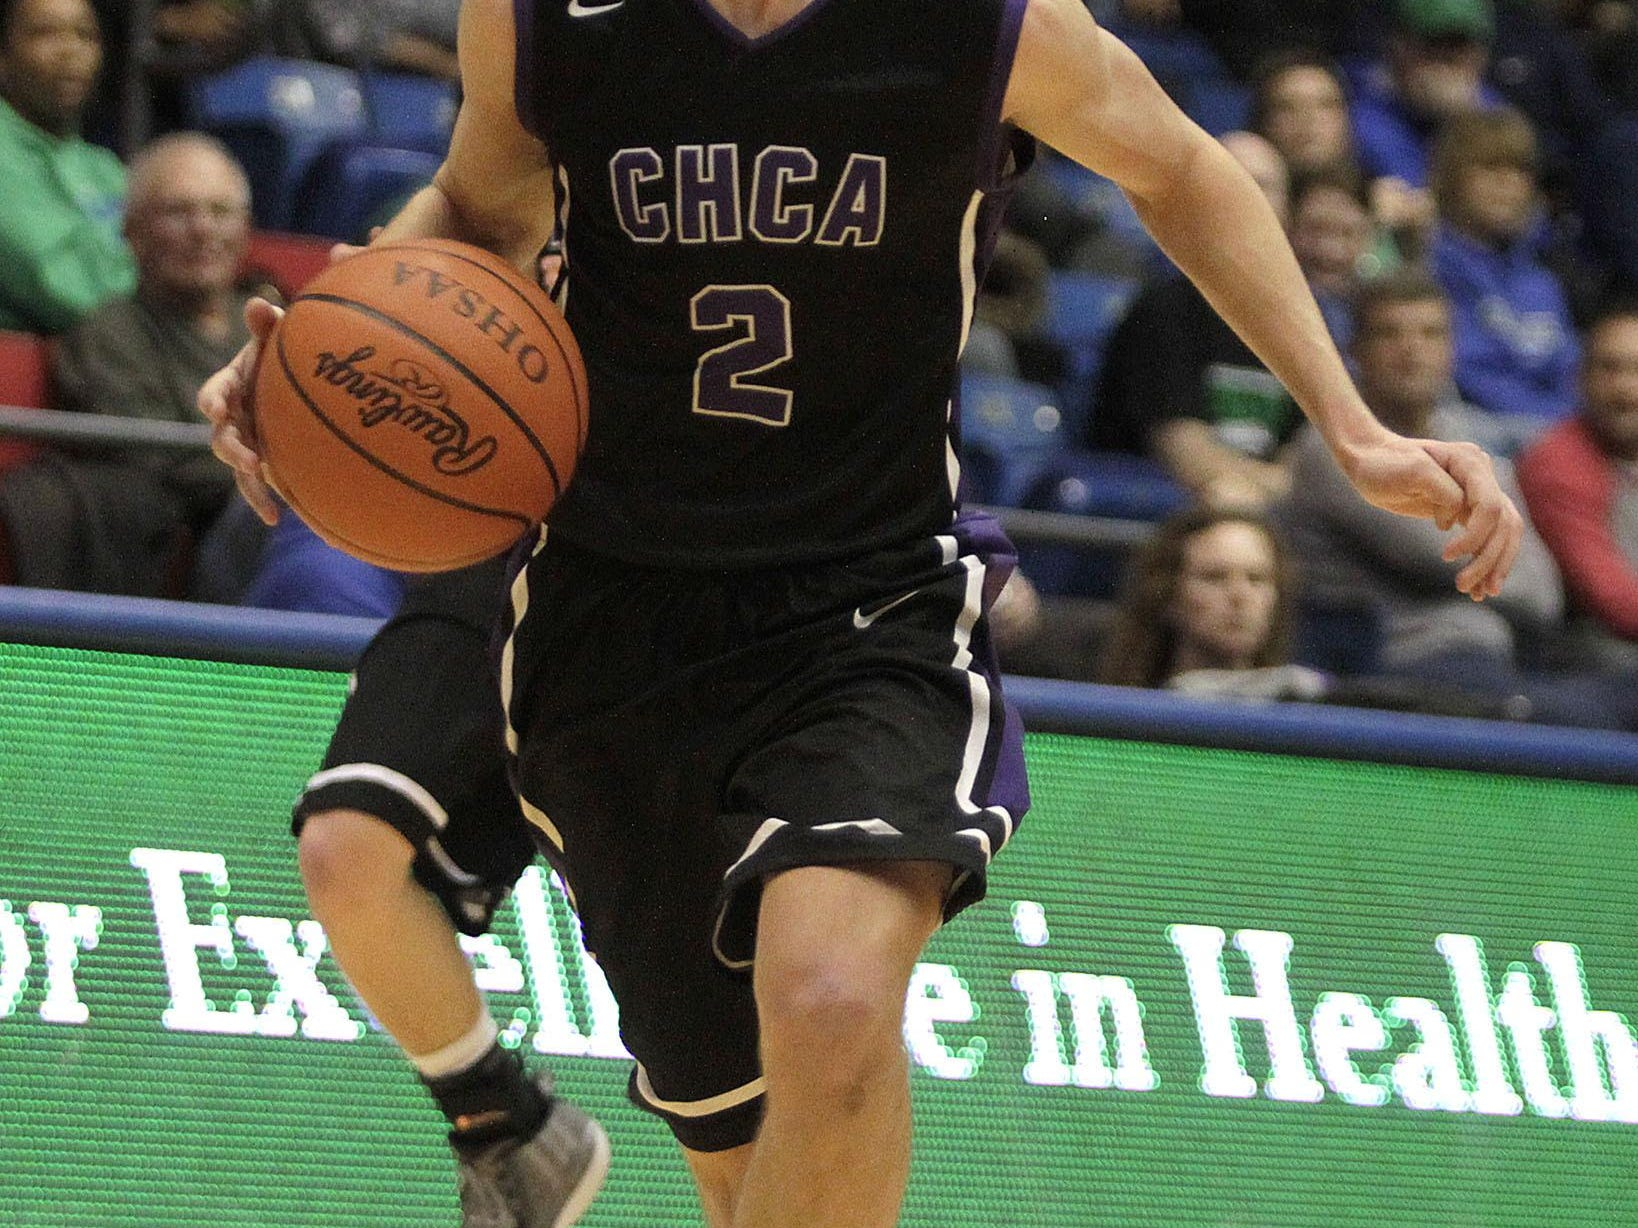 Erik Kohlan goes on a fast break for CHCA.